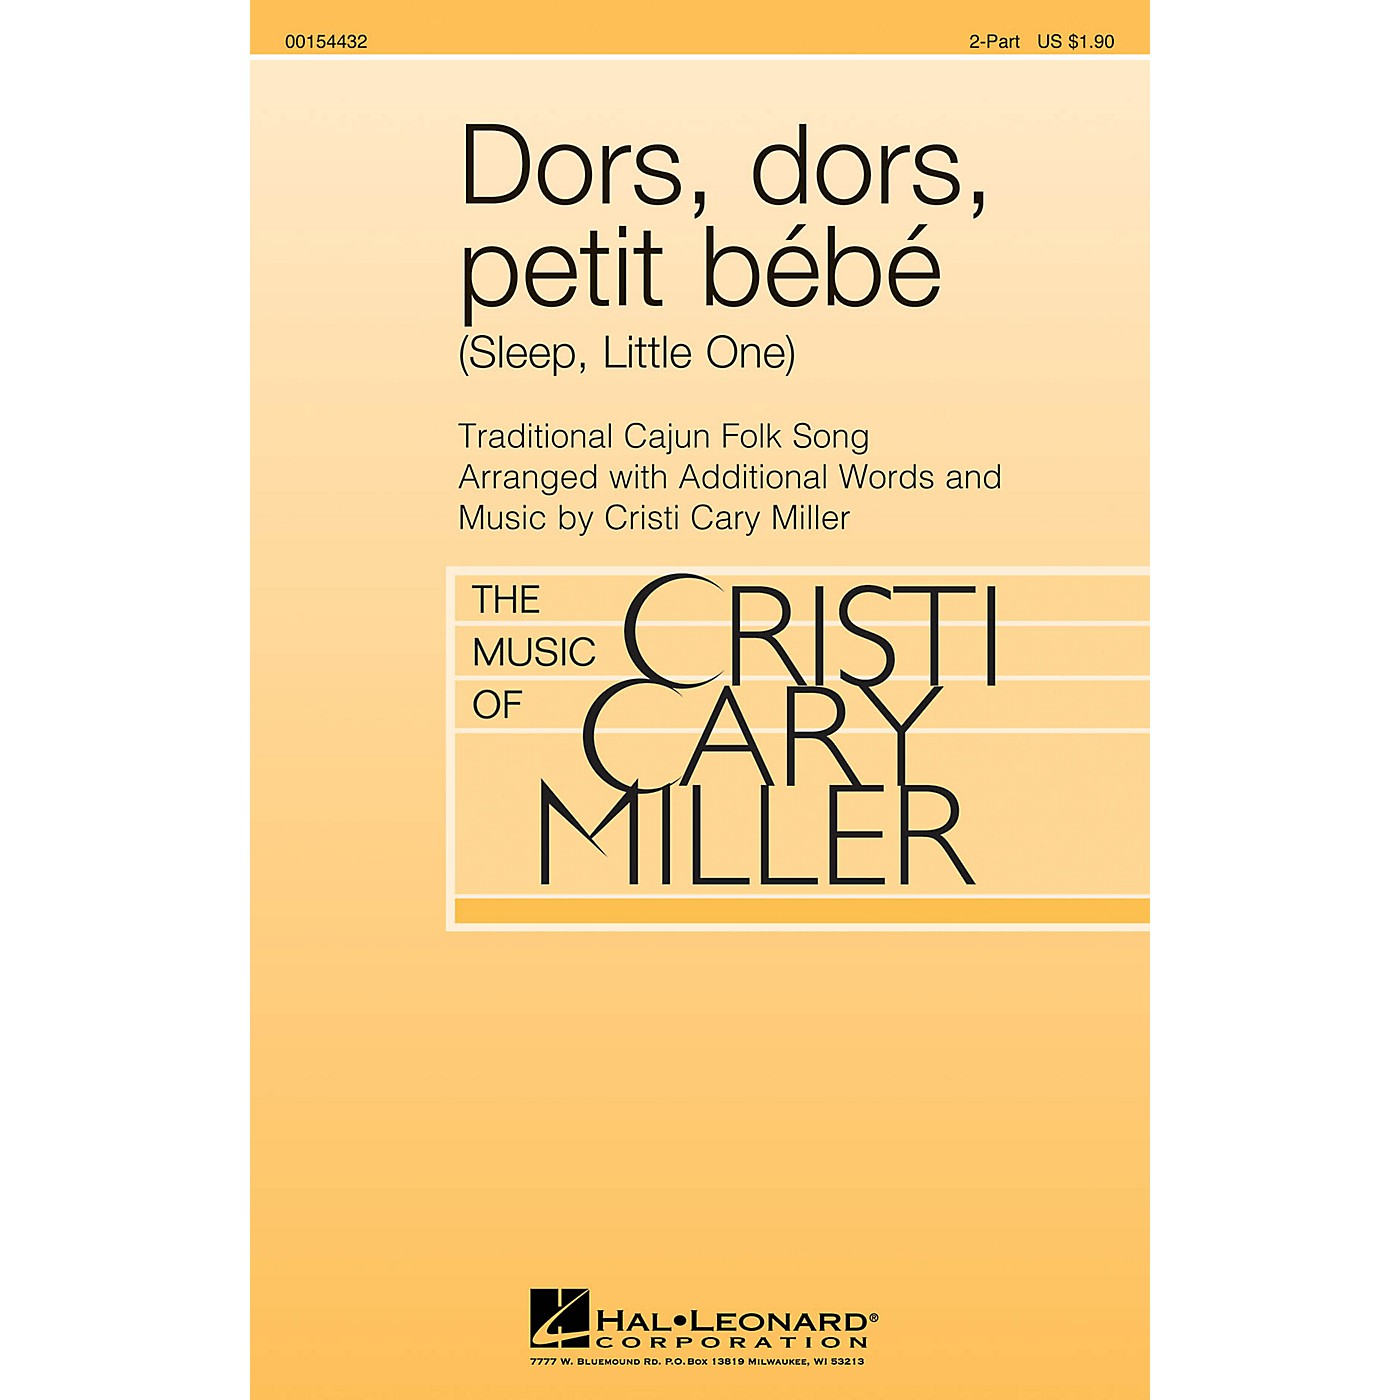 Hal Leonard Dors, dors, petit bébé (Sleep, Little One) 2-Part arranged by Cristi Cary Miller thumbnail